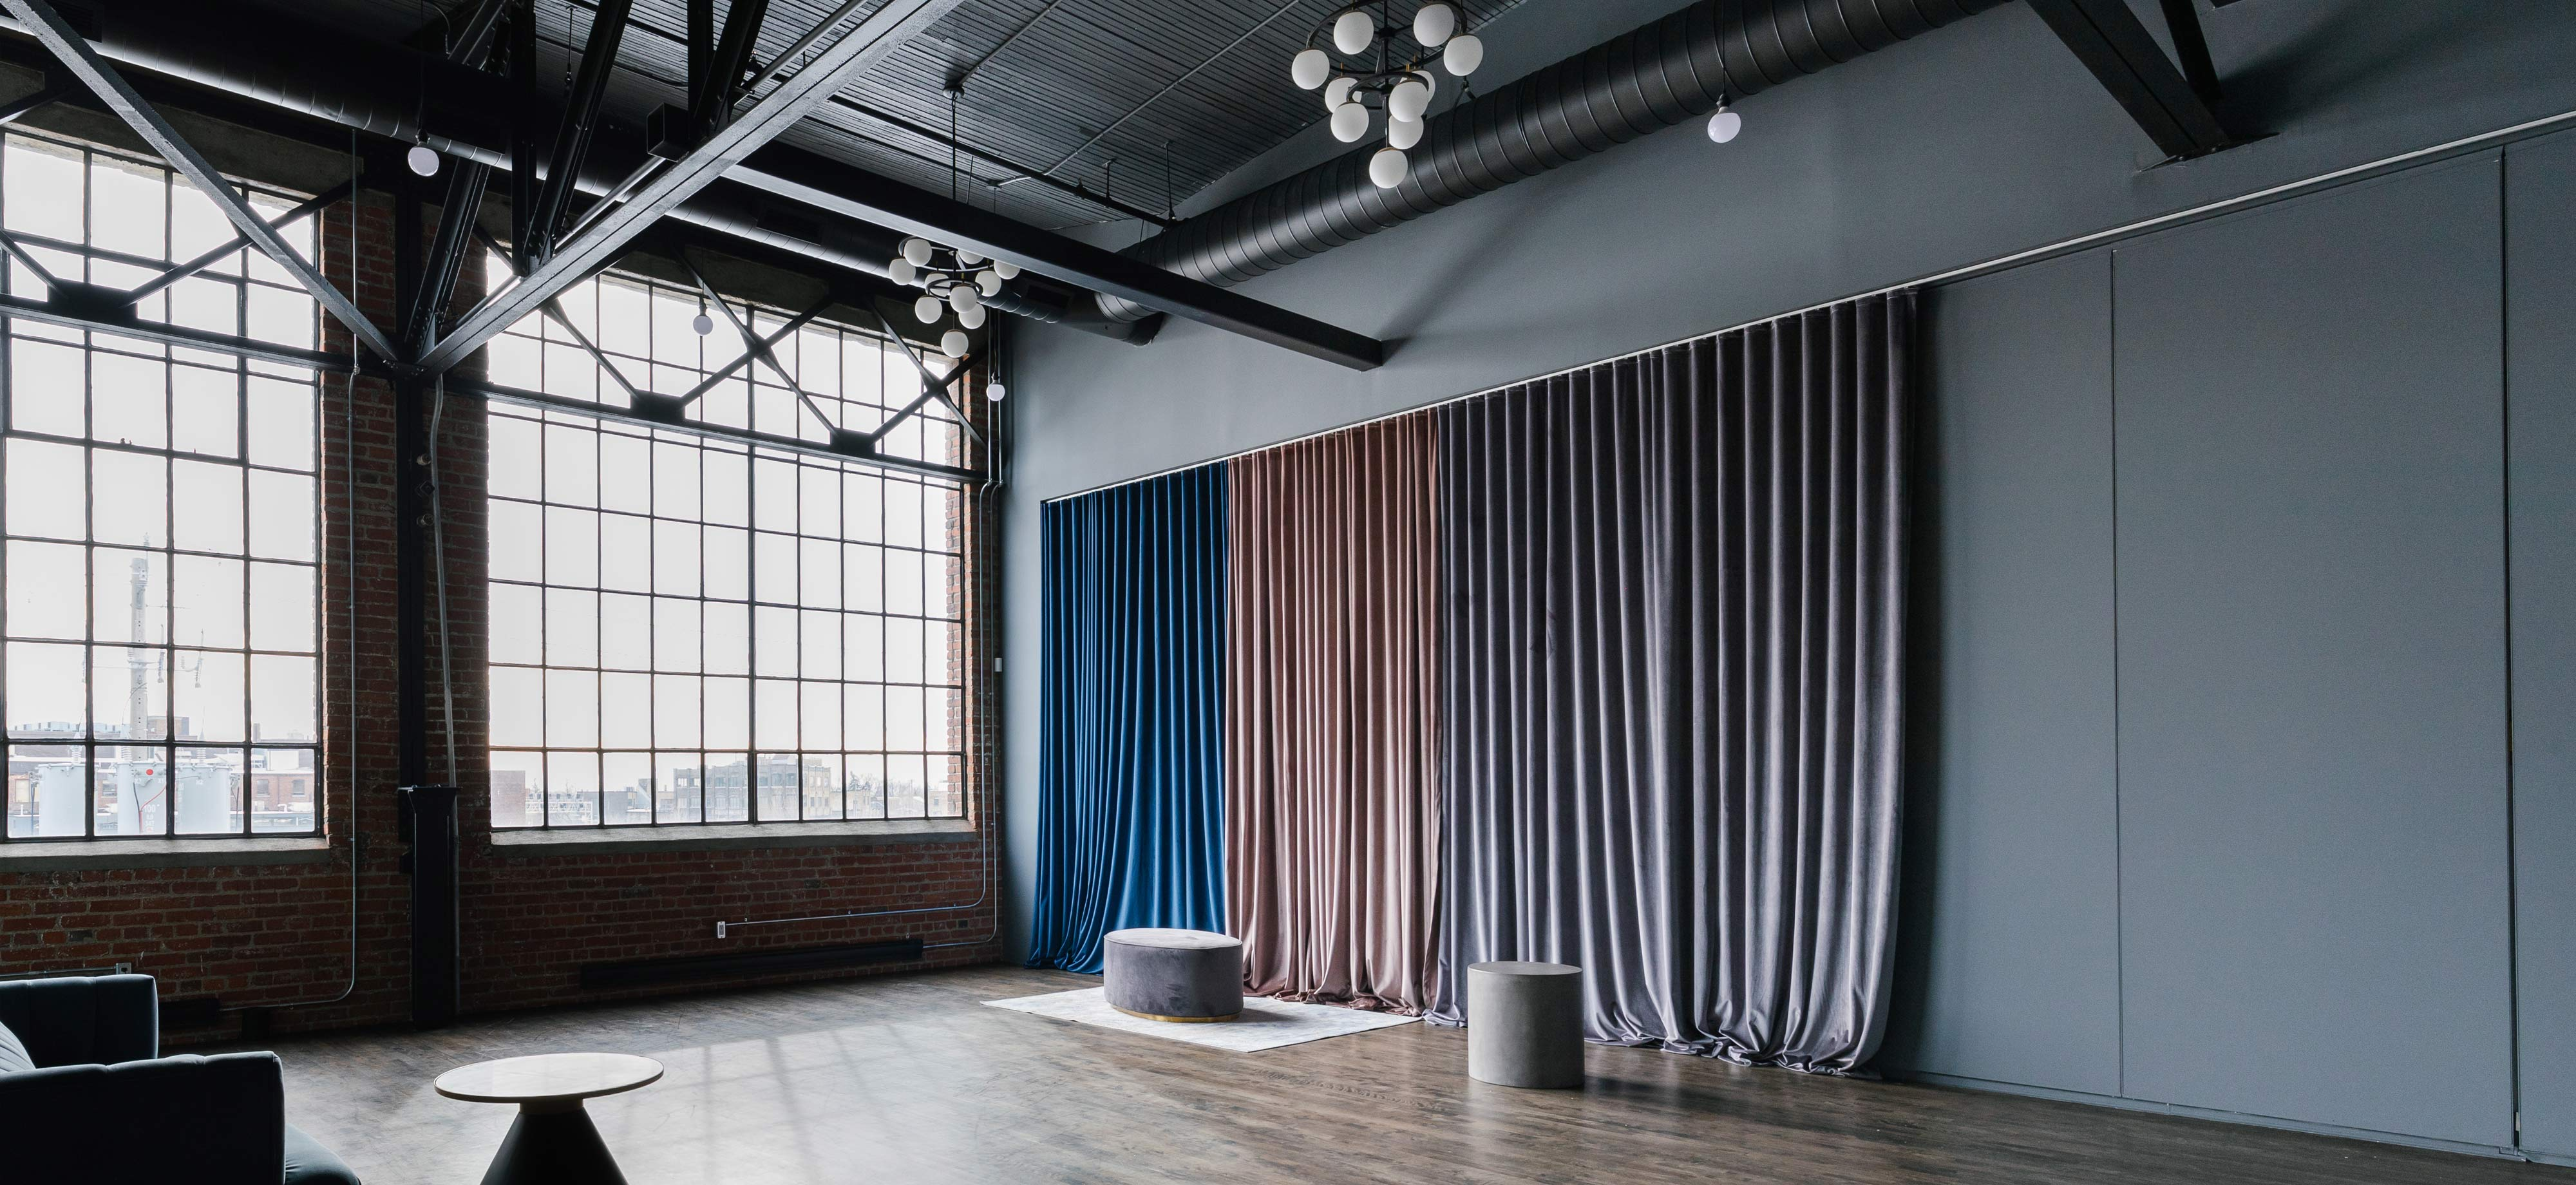 east side studio drapes